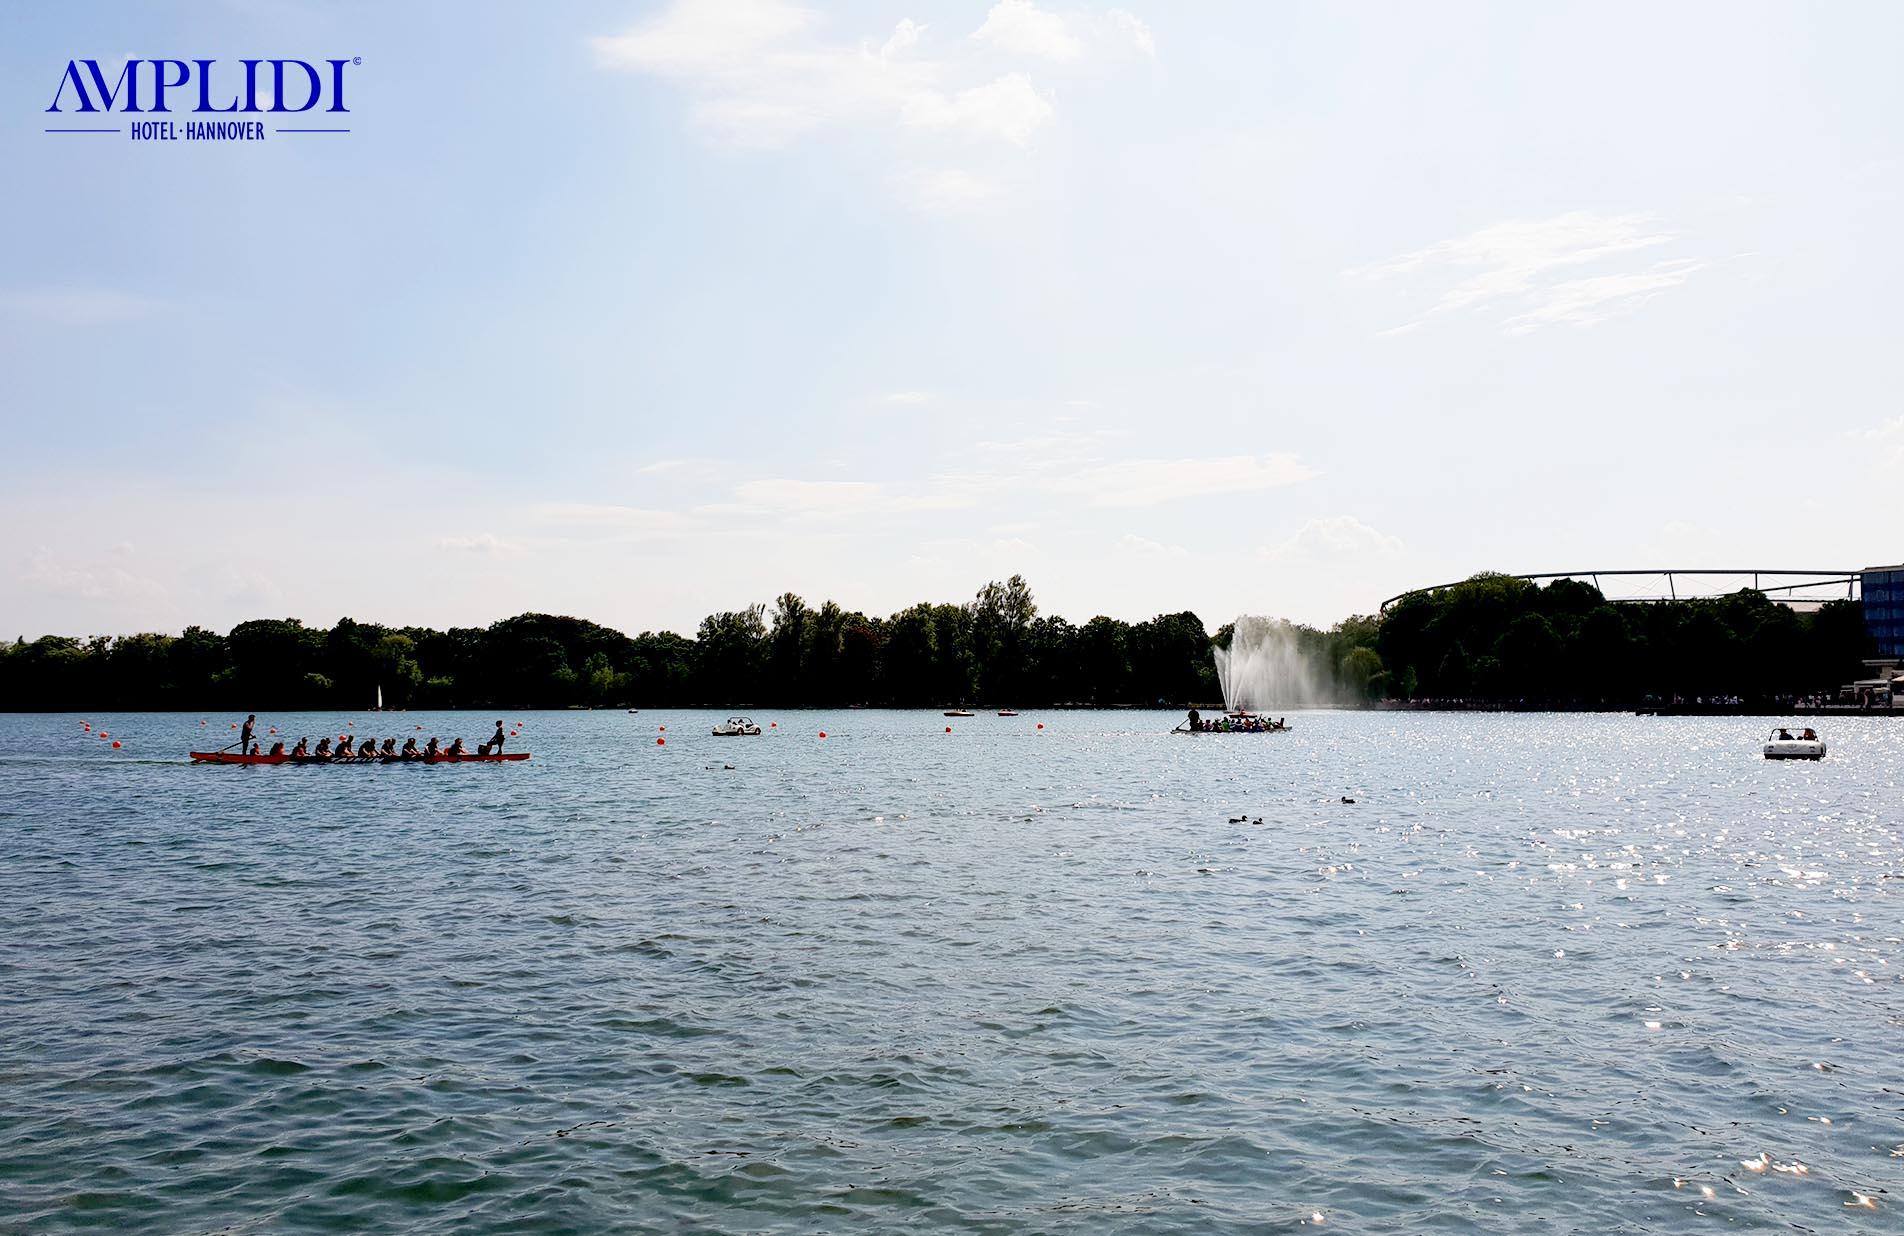 Boote auf dem Maschsee in Hannover